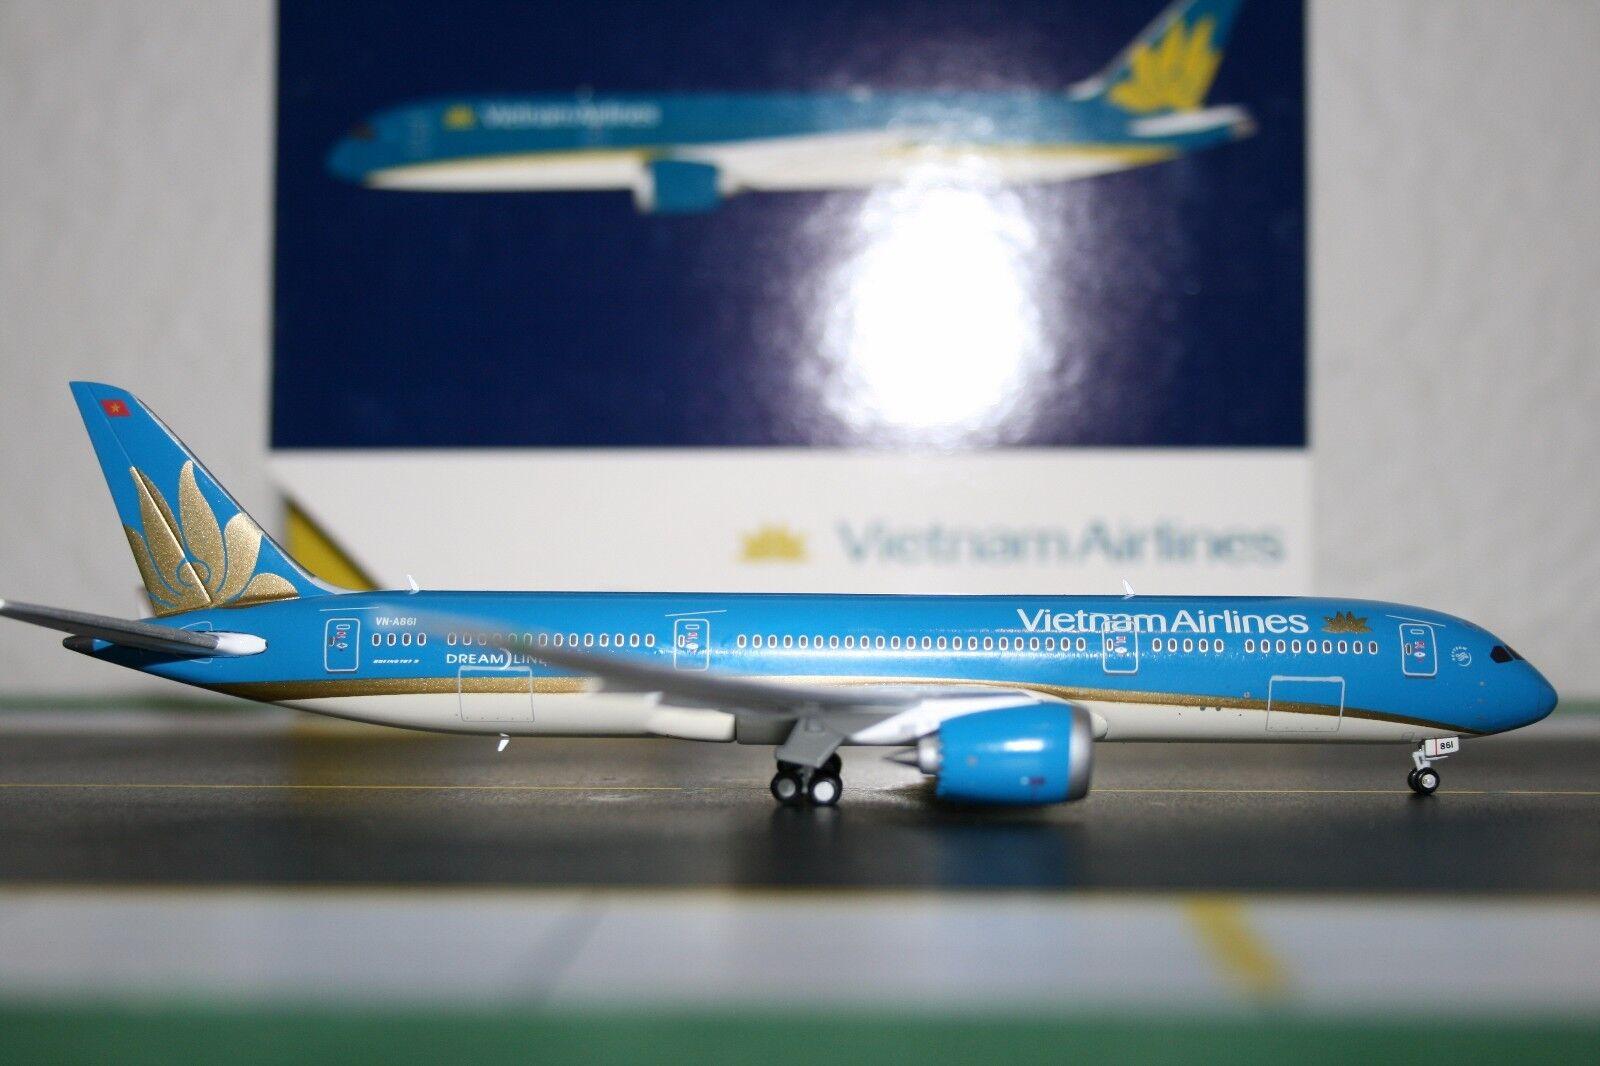 Gemini - jets 1 400 vietnam airlines boeing 787-9 vn-a861 (gjhvn1478) modellflugzeug